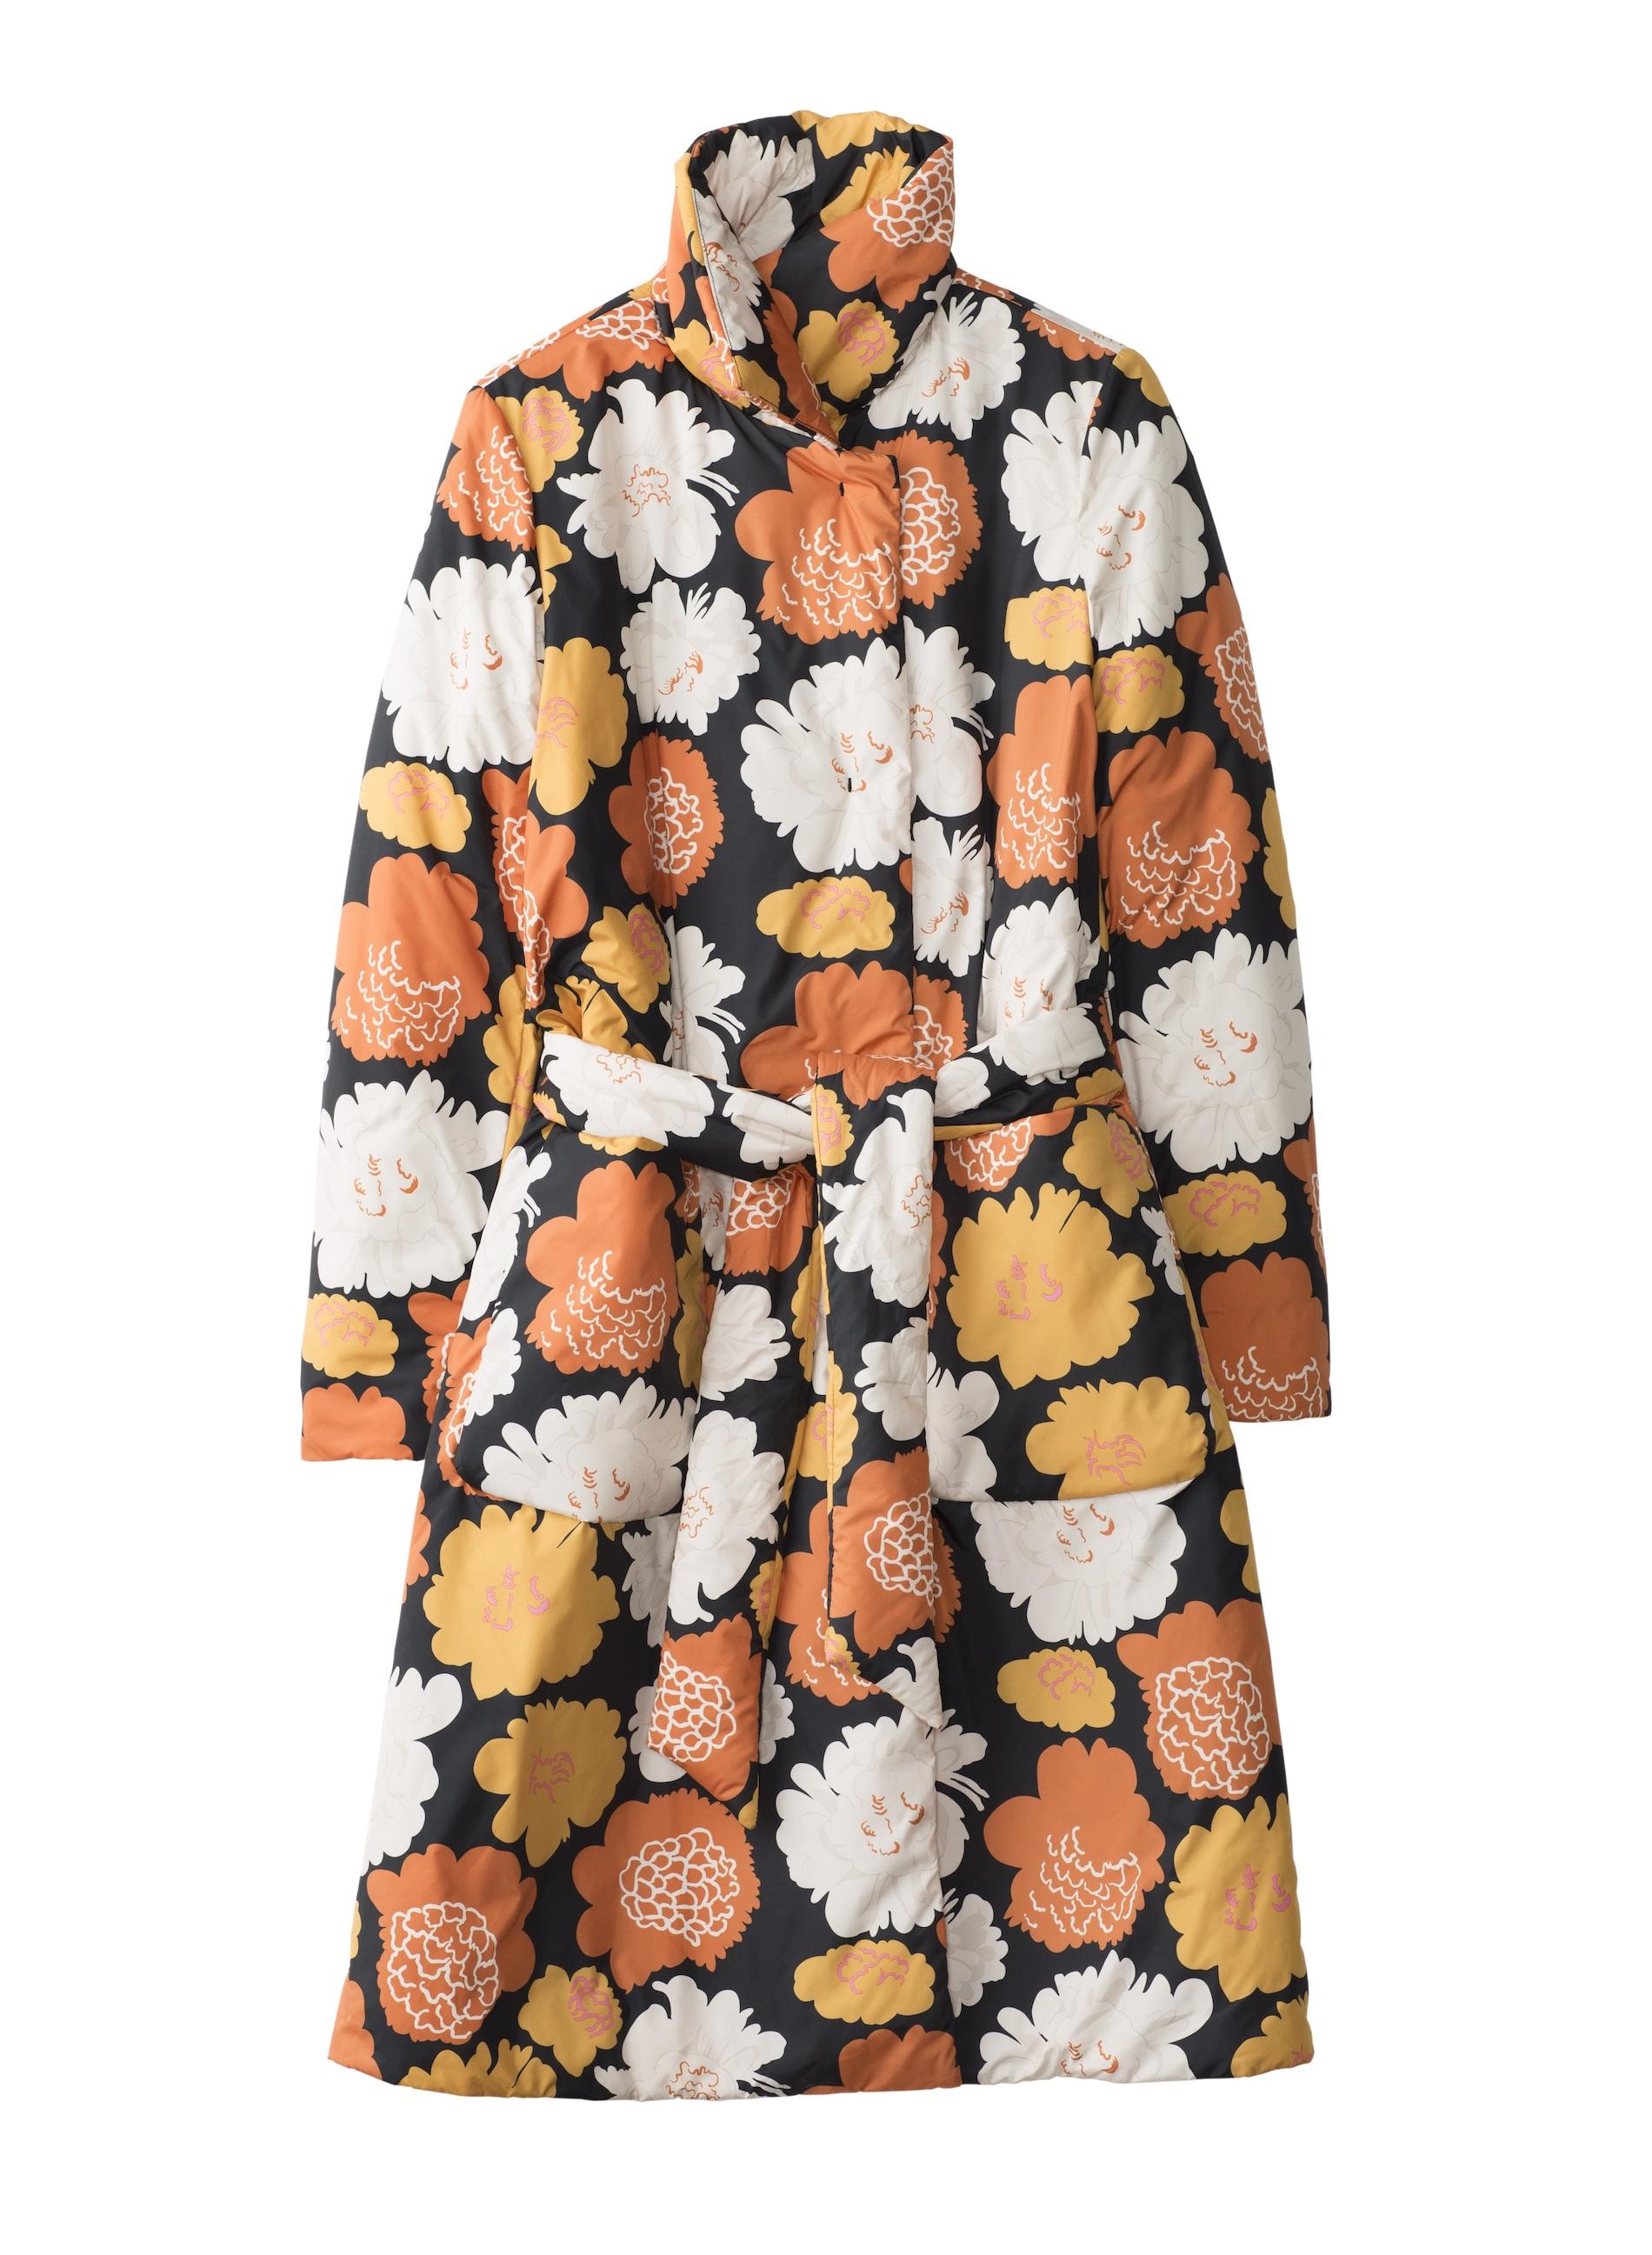 Katjuska Coat